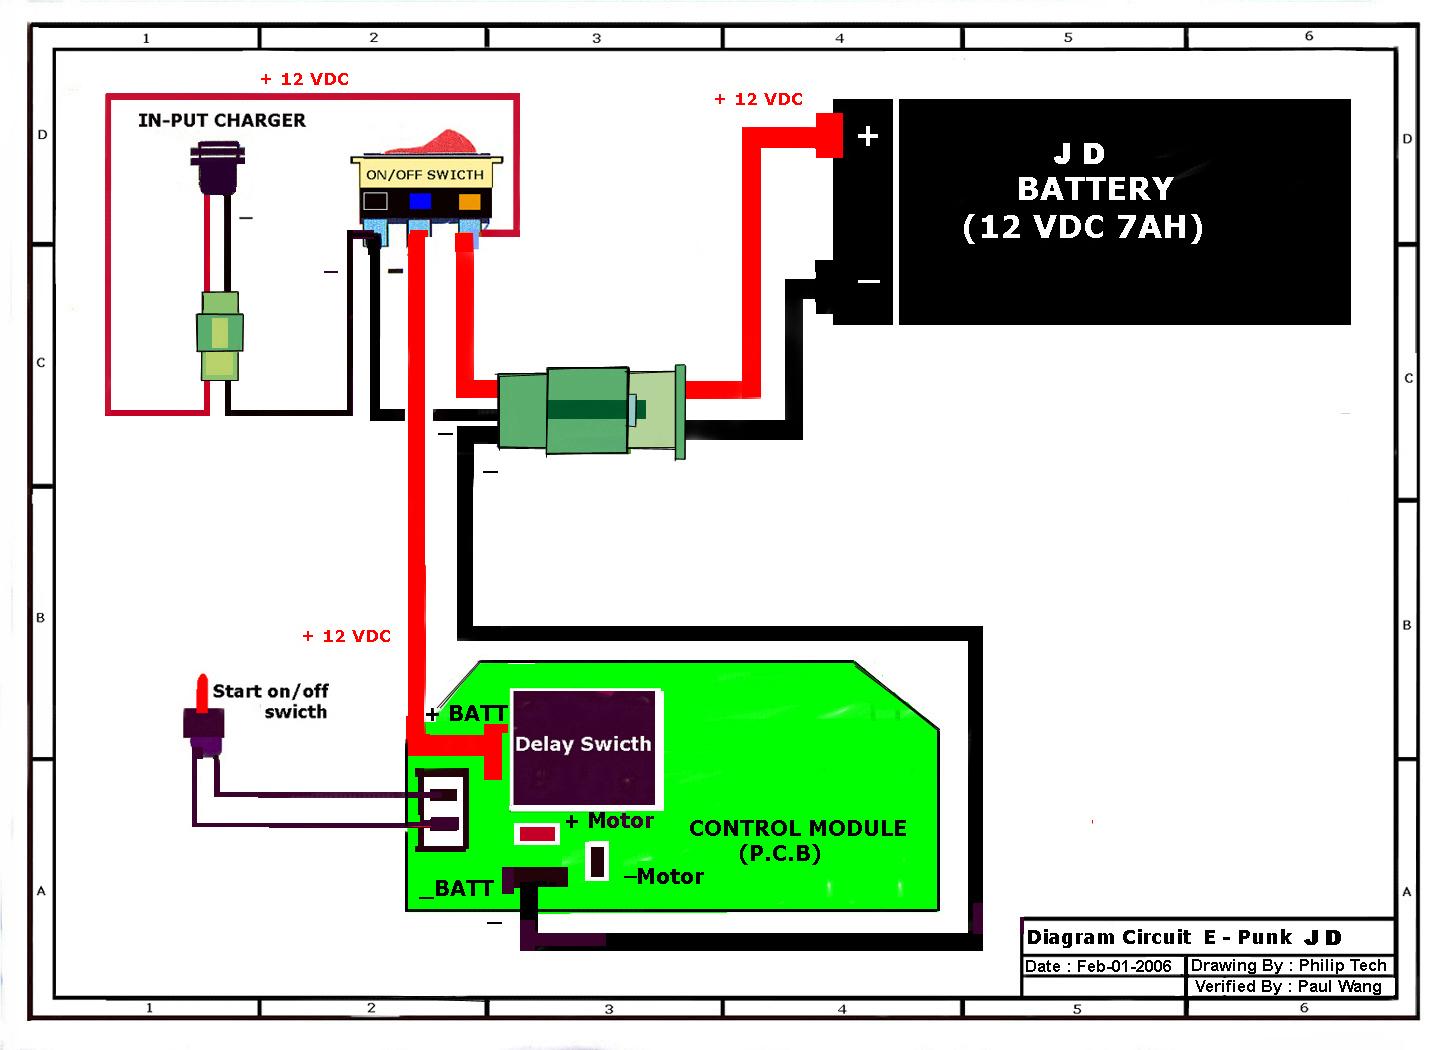 razor epunk wiring diagram jd?resize\\\\\\\=665%2C484\\\\\\\&ssl\\\\\\\=1 e300 wiring diagram gandul 45 77 79 119  at cos-gaming.co